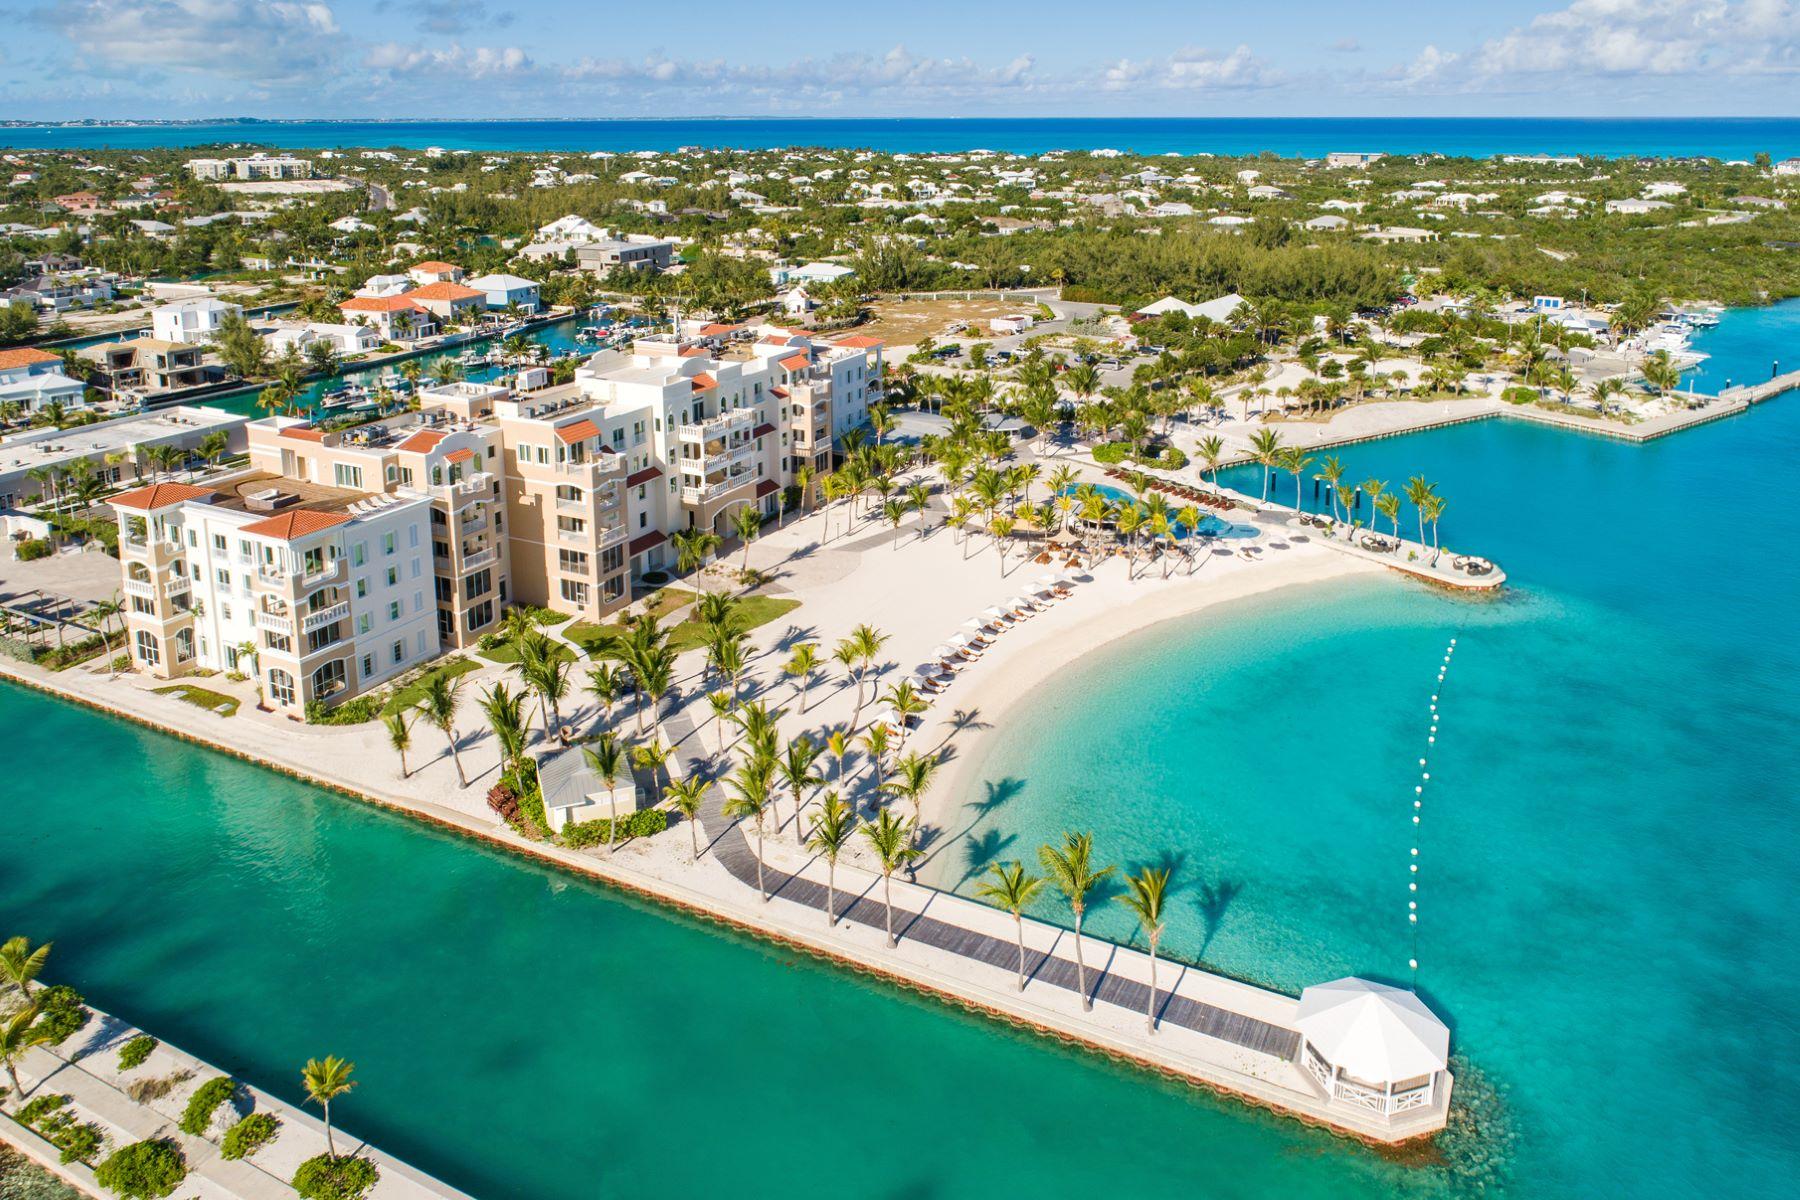 Condominium for Sale at Blue Haven Resort - Suite 405.06 Blue Haven - Suite 405.06 Leeward, Providenciales TKCA 1ZZ Turks And Caicos Islands